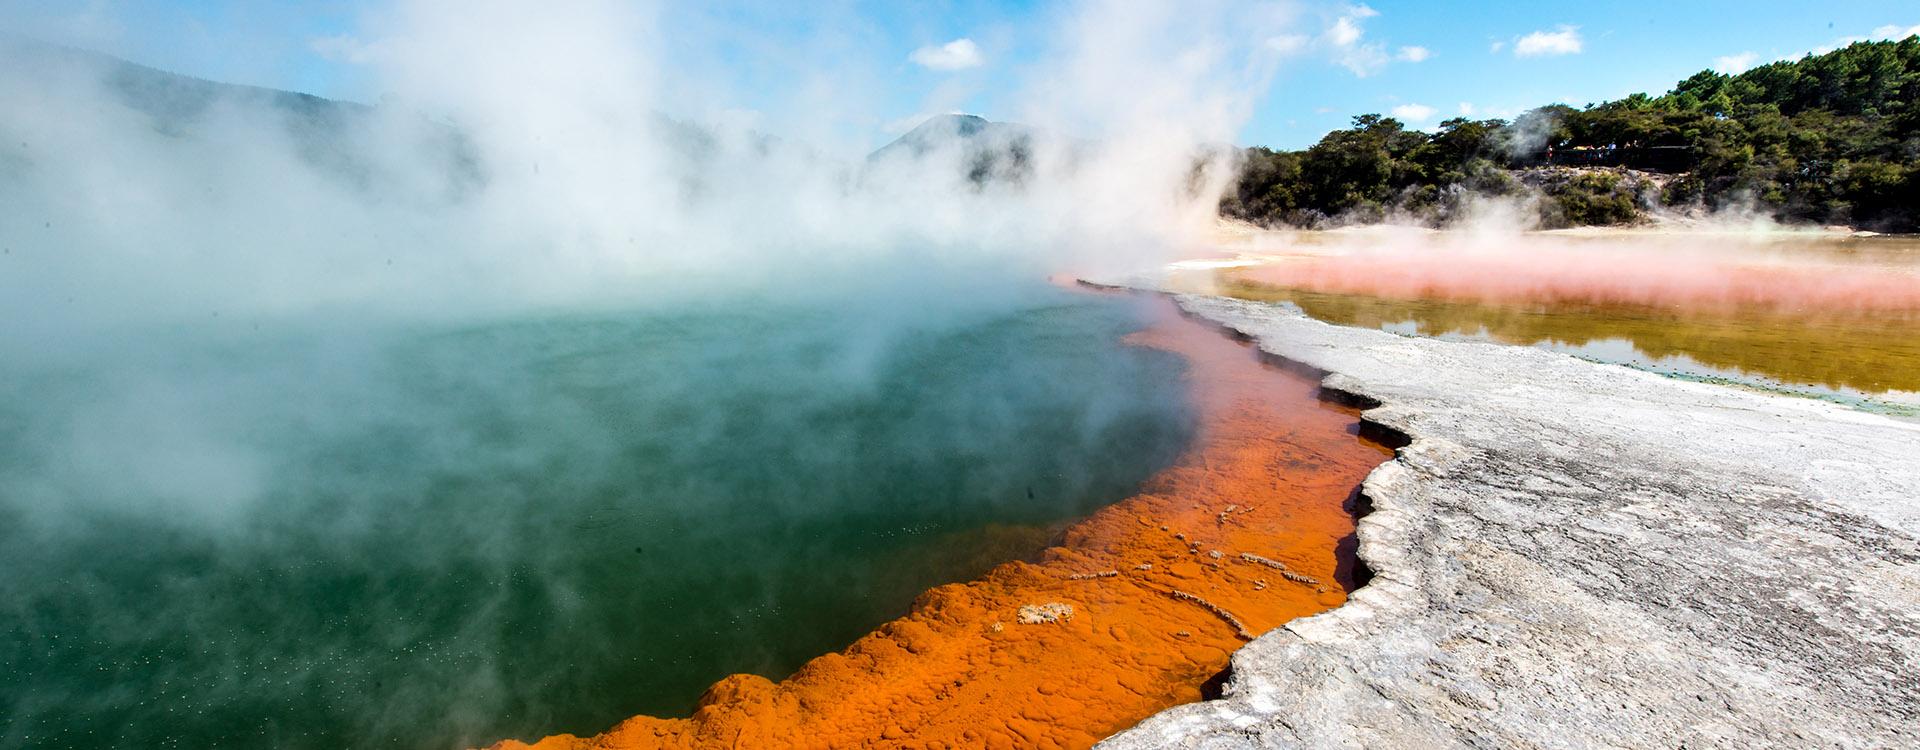 Wai o Tapu in New Zealand, the volcanic wonderland